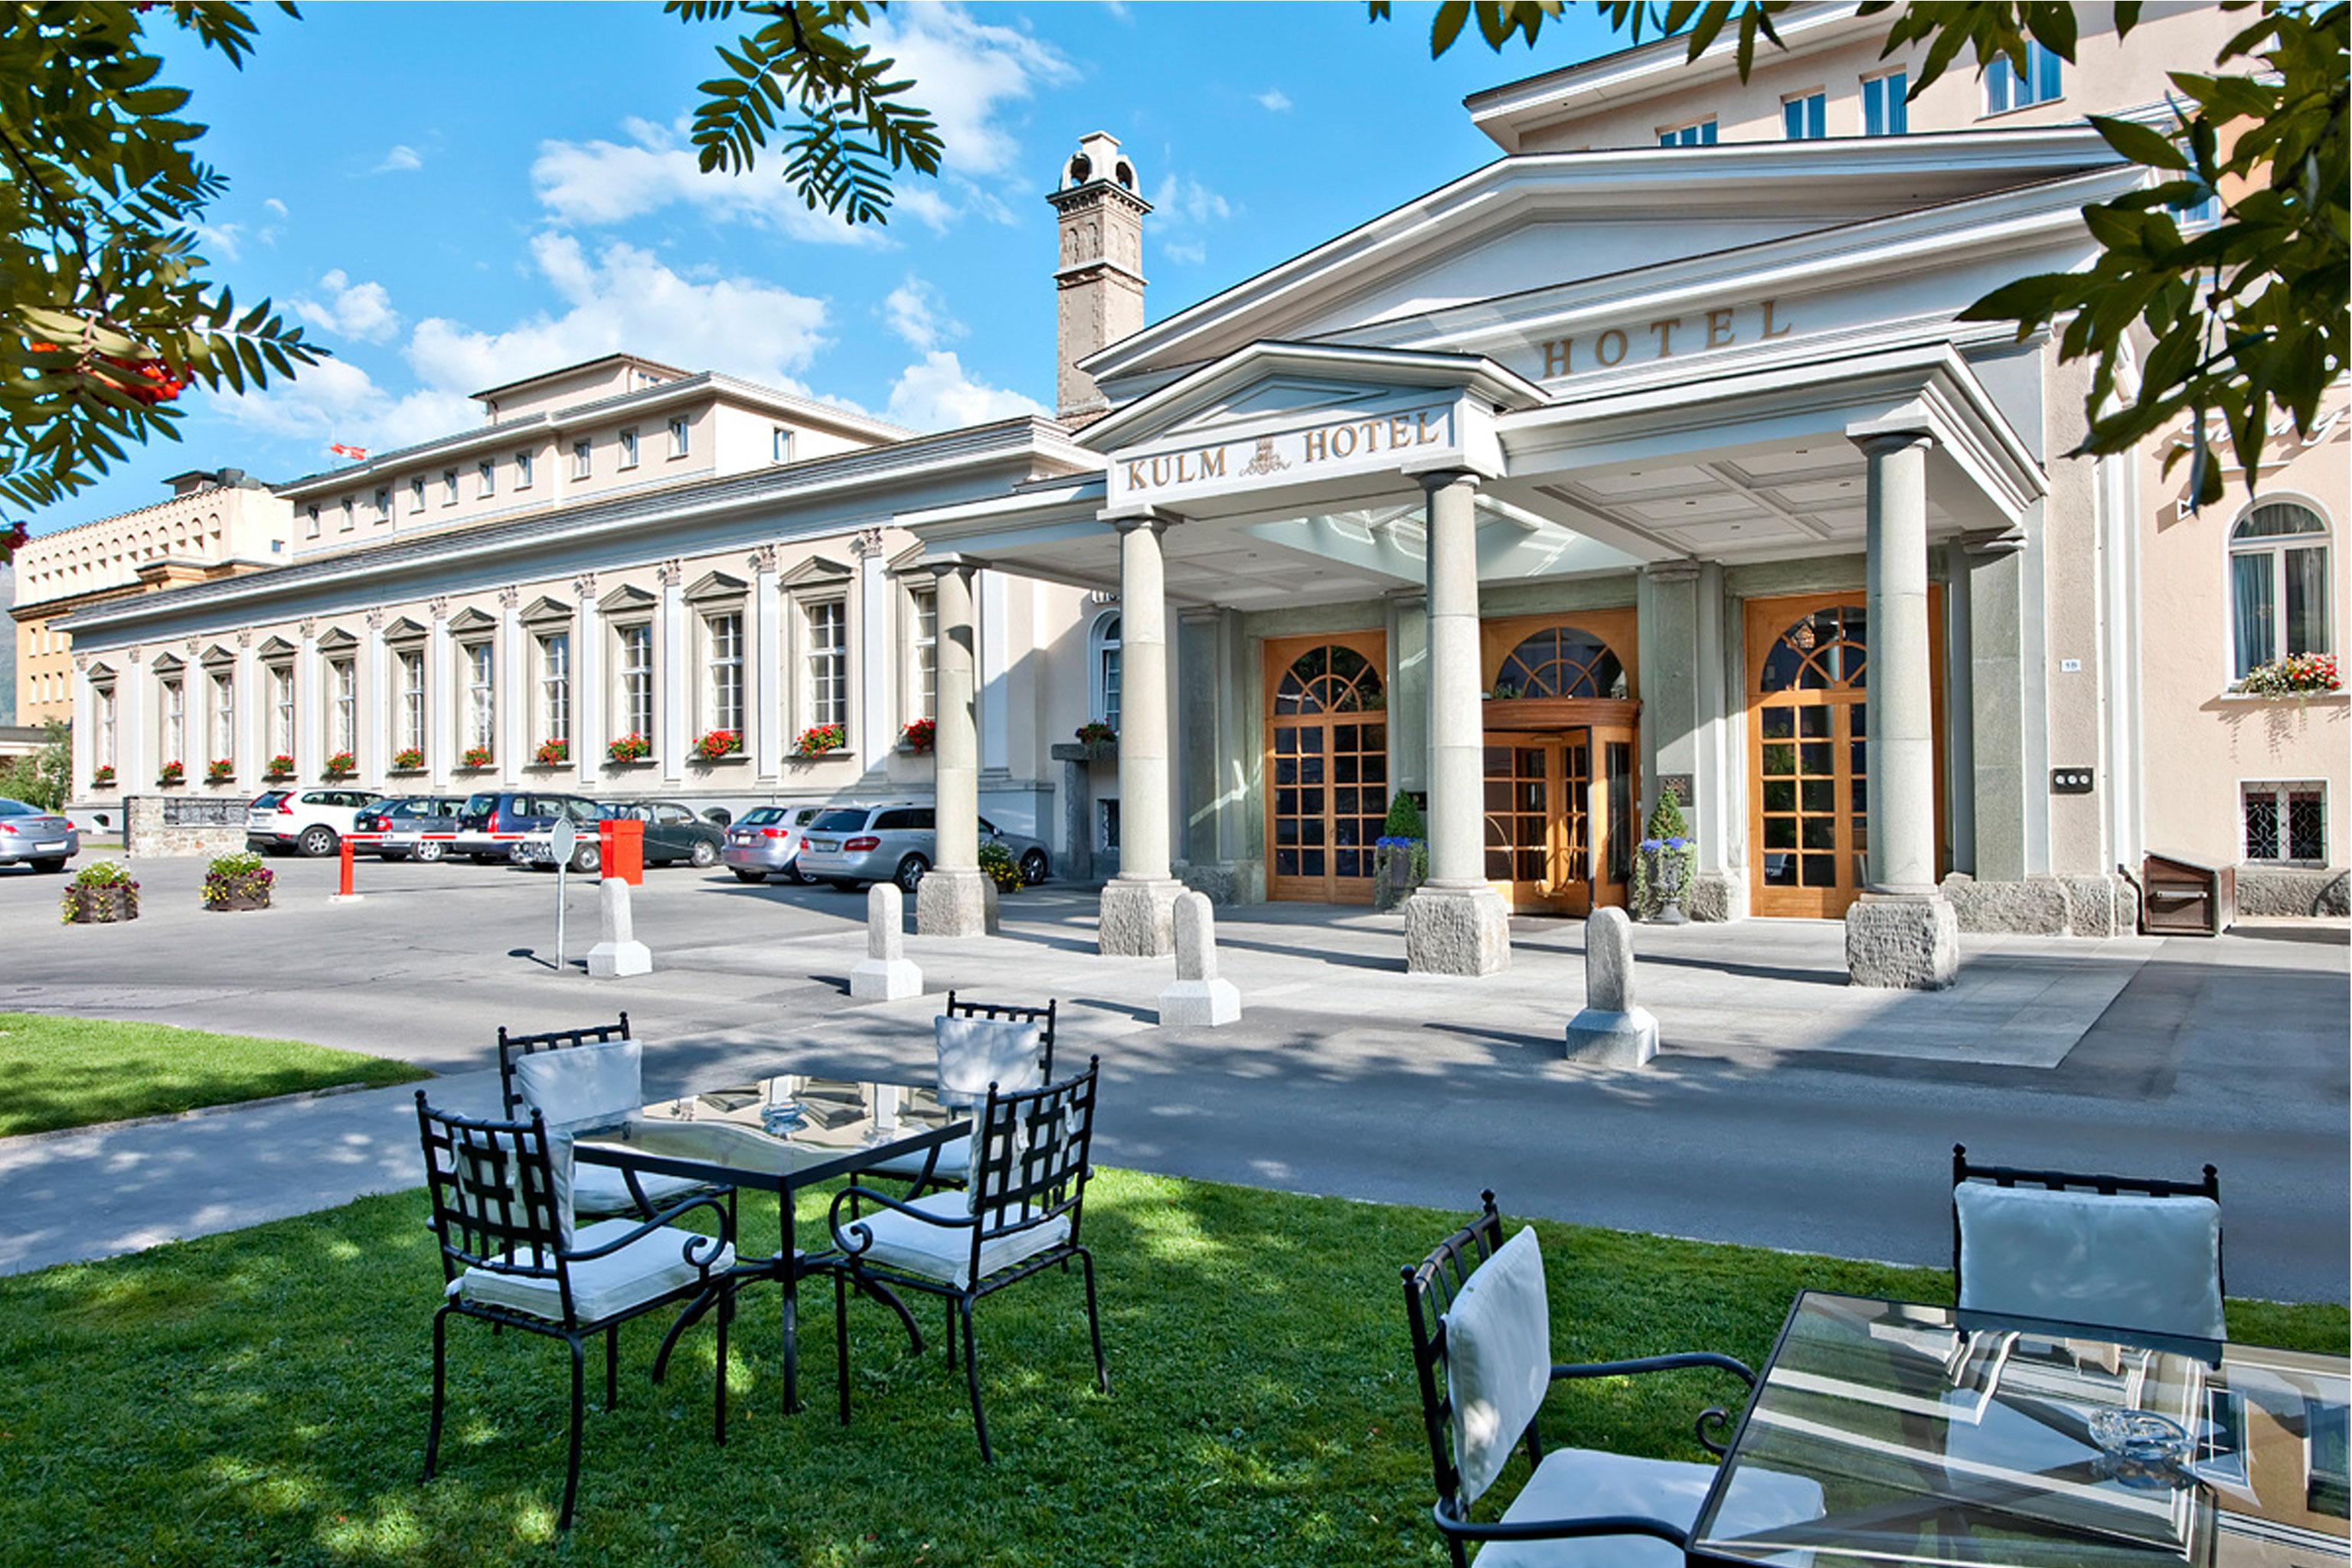 Palace Hotel St Moritz Bilder